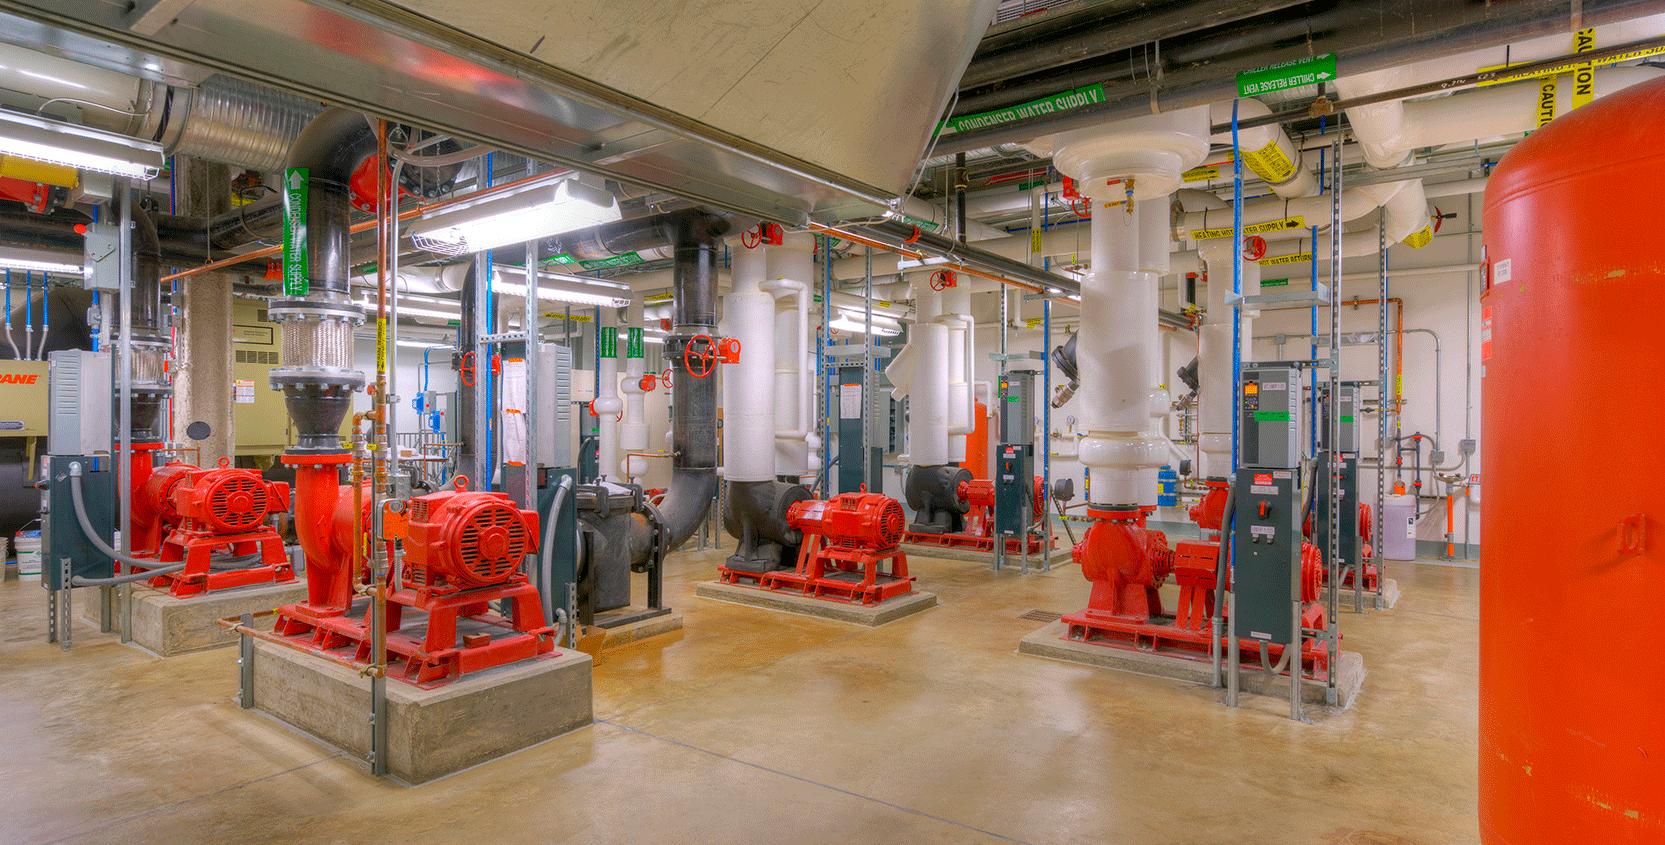 University-of-Michigan-ASCP-Mechanical-Room-1665x845